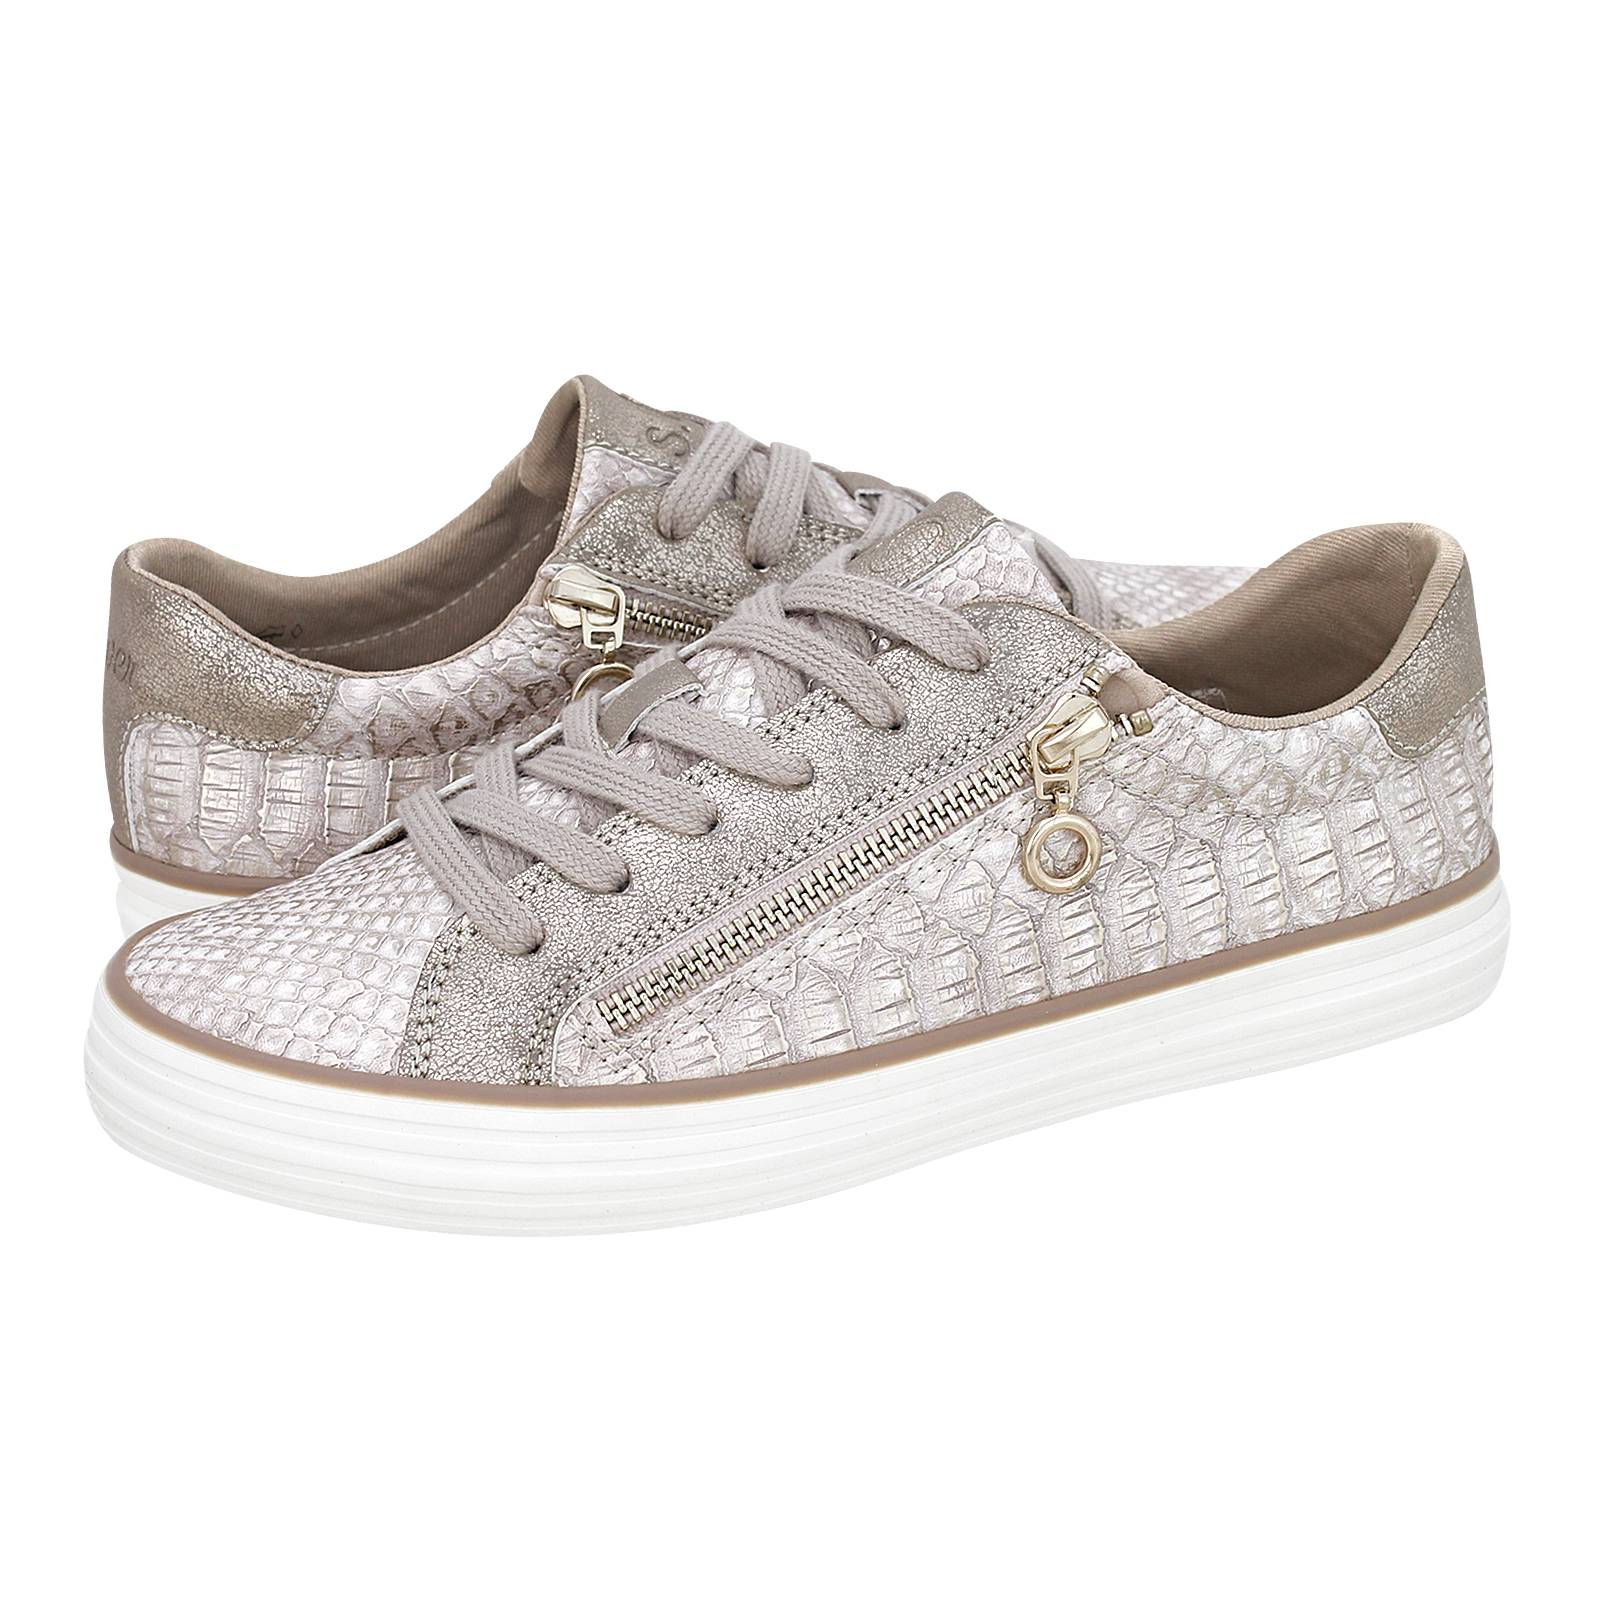 Chirols - Γυναικεία παπούτσια casual s.Oliver από δερμα croco ... e40144180b9